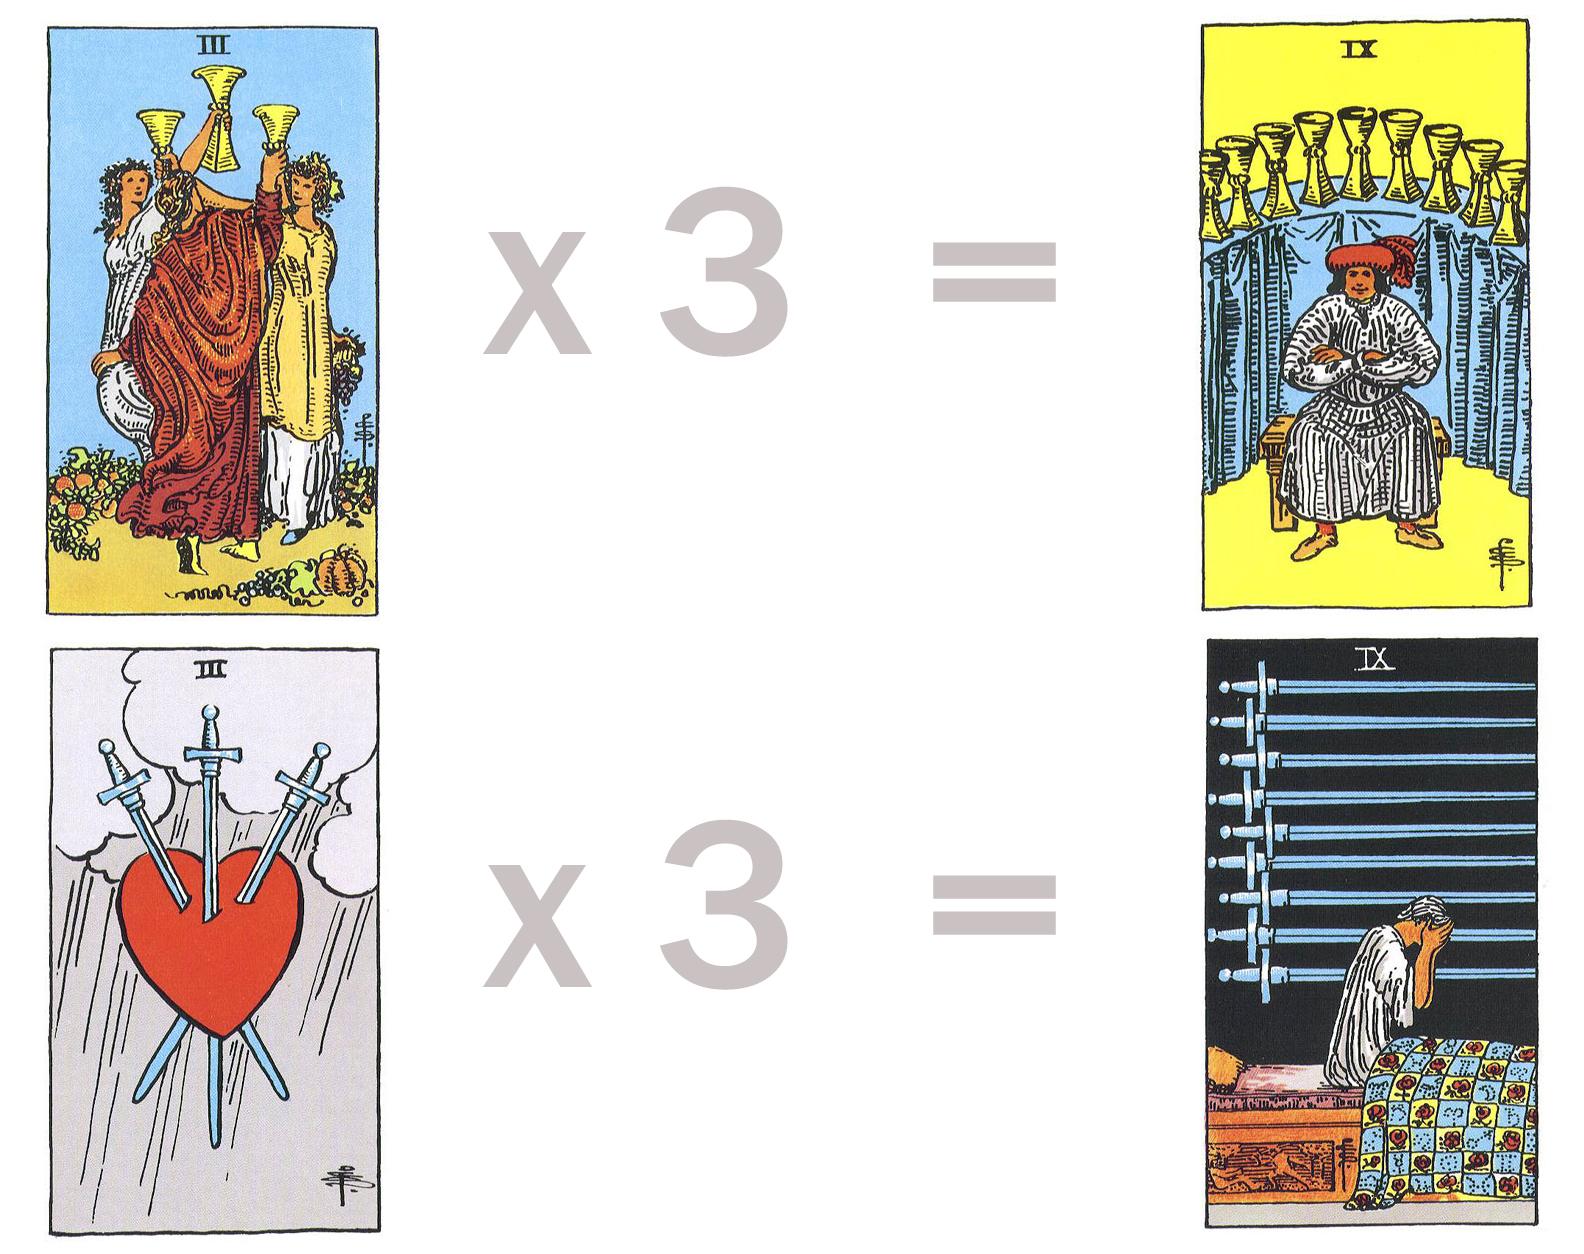 Three times Abundance = Happiness Three times Sorrow = Cruelty & Despair